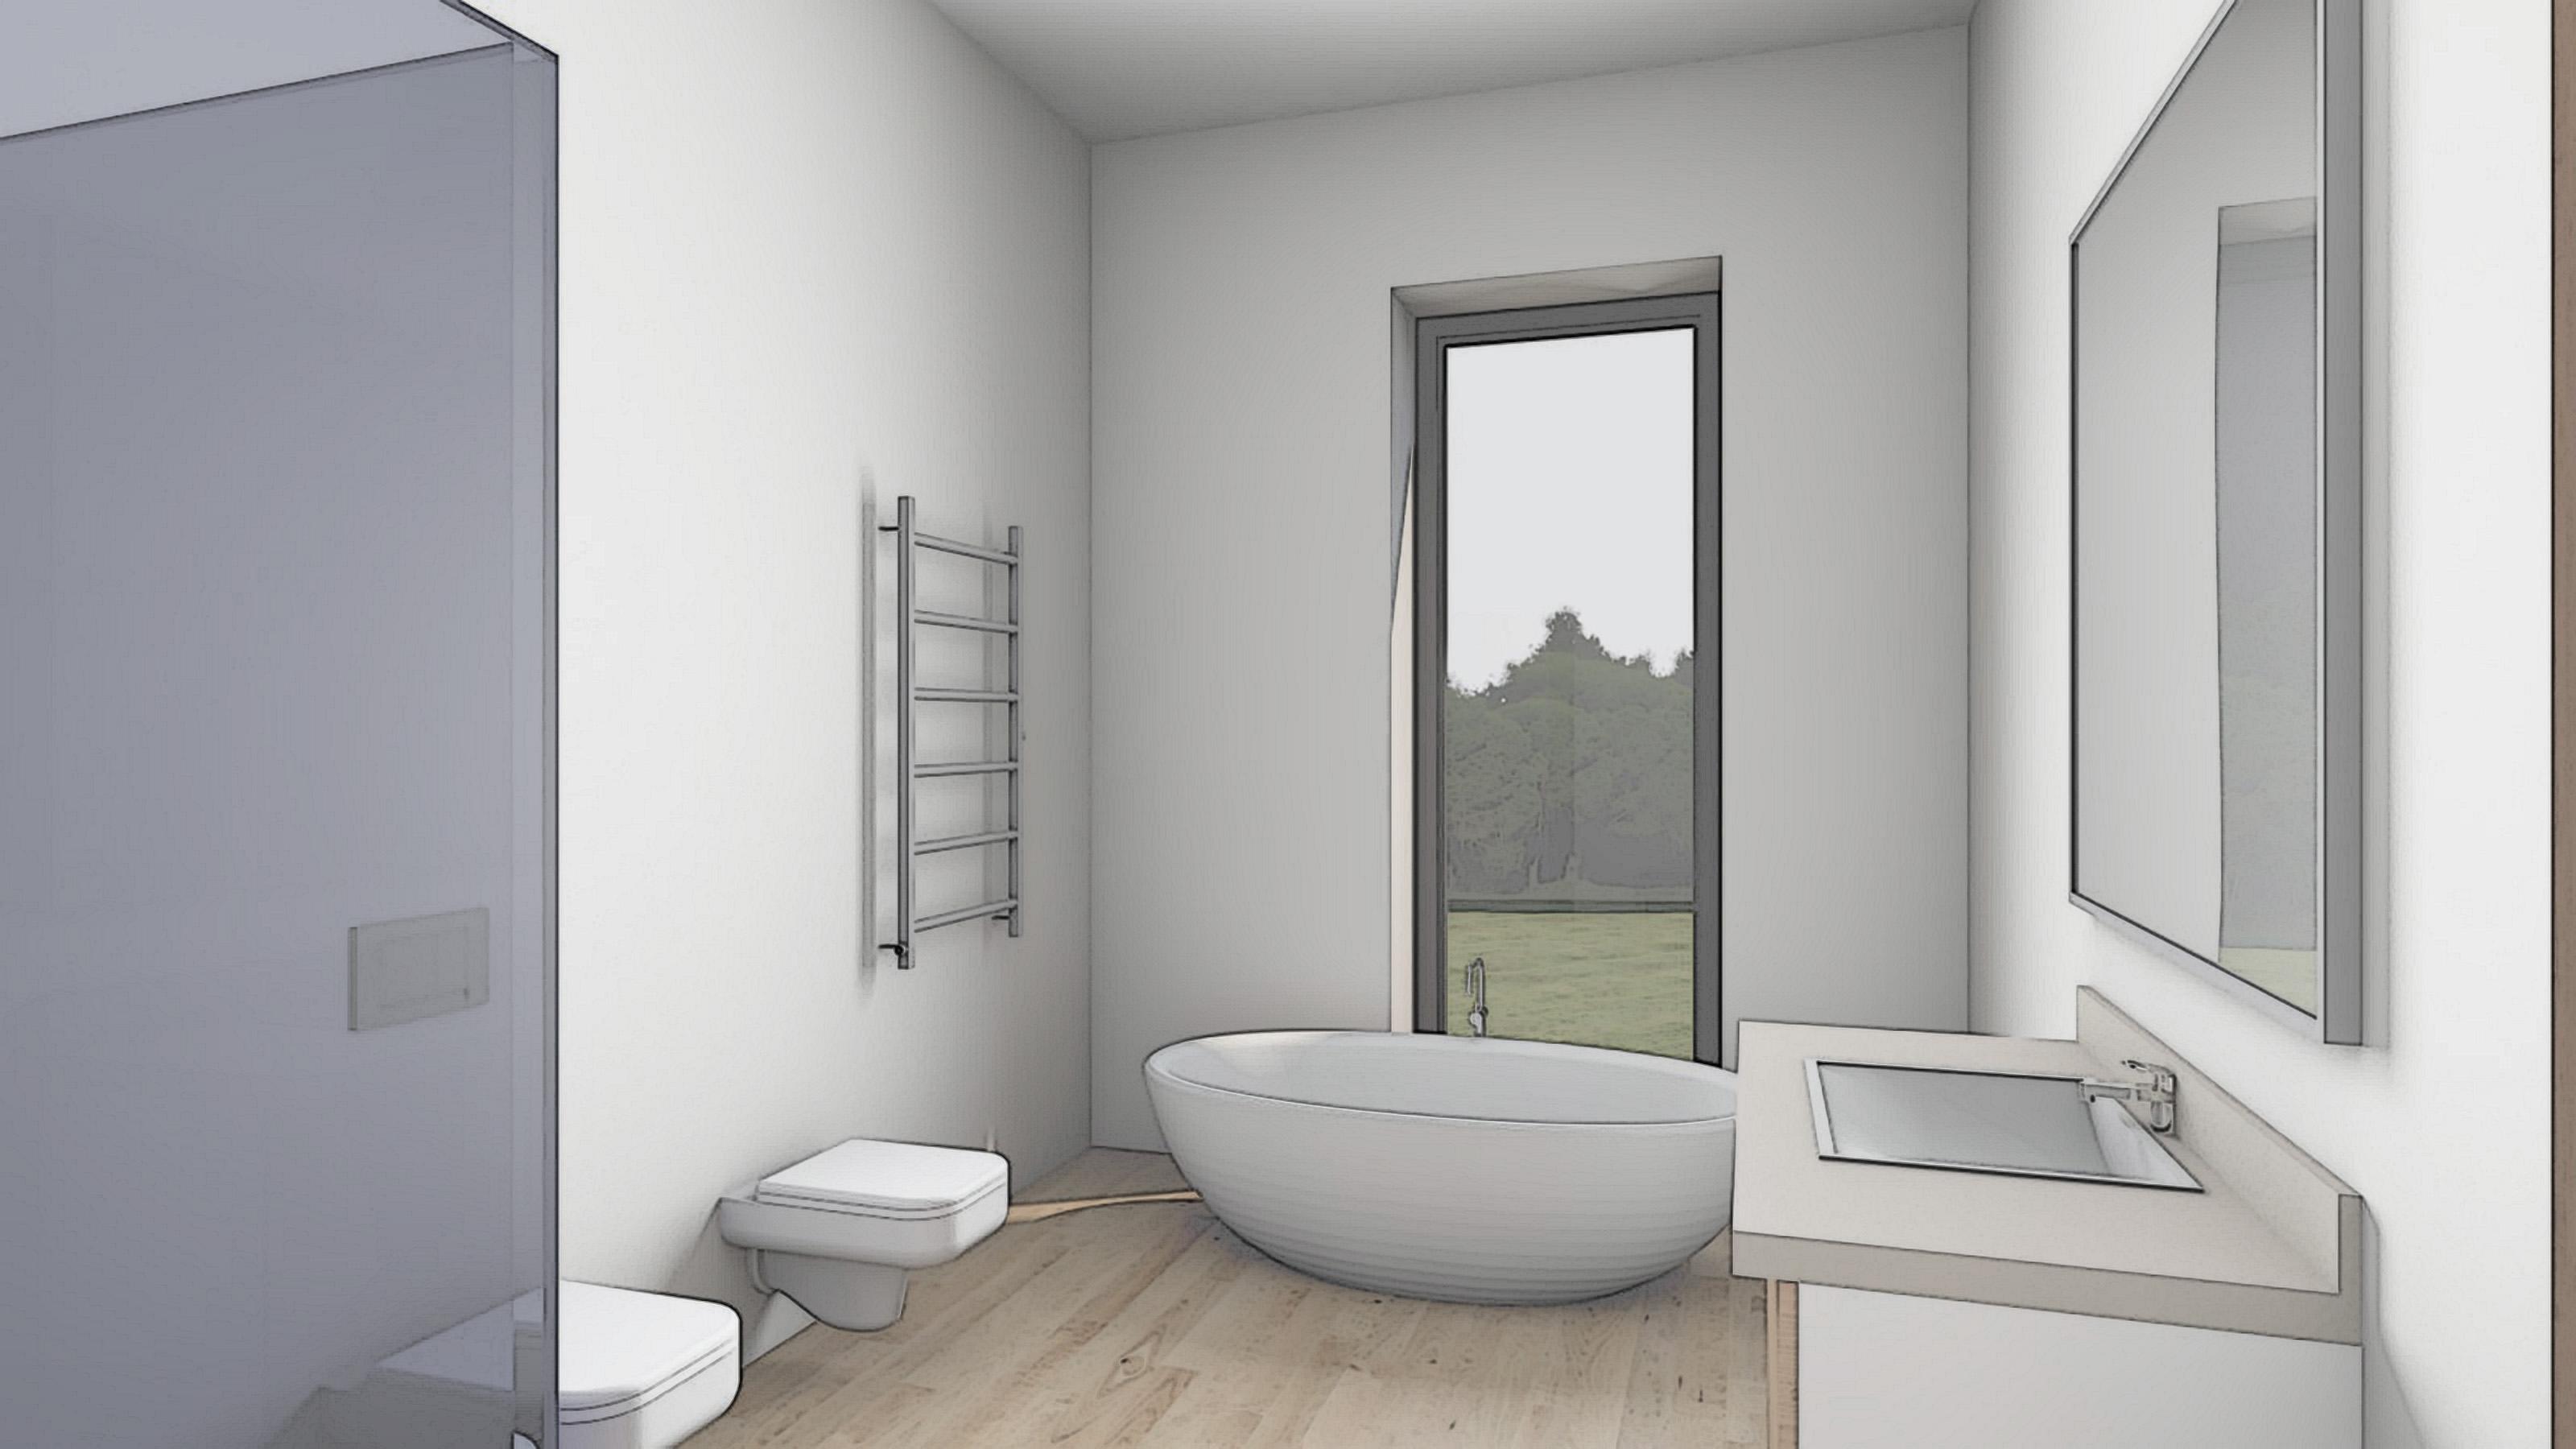 Изображение для проекта Проект особняка в Латвии в стиле модерн 2908